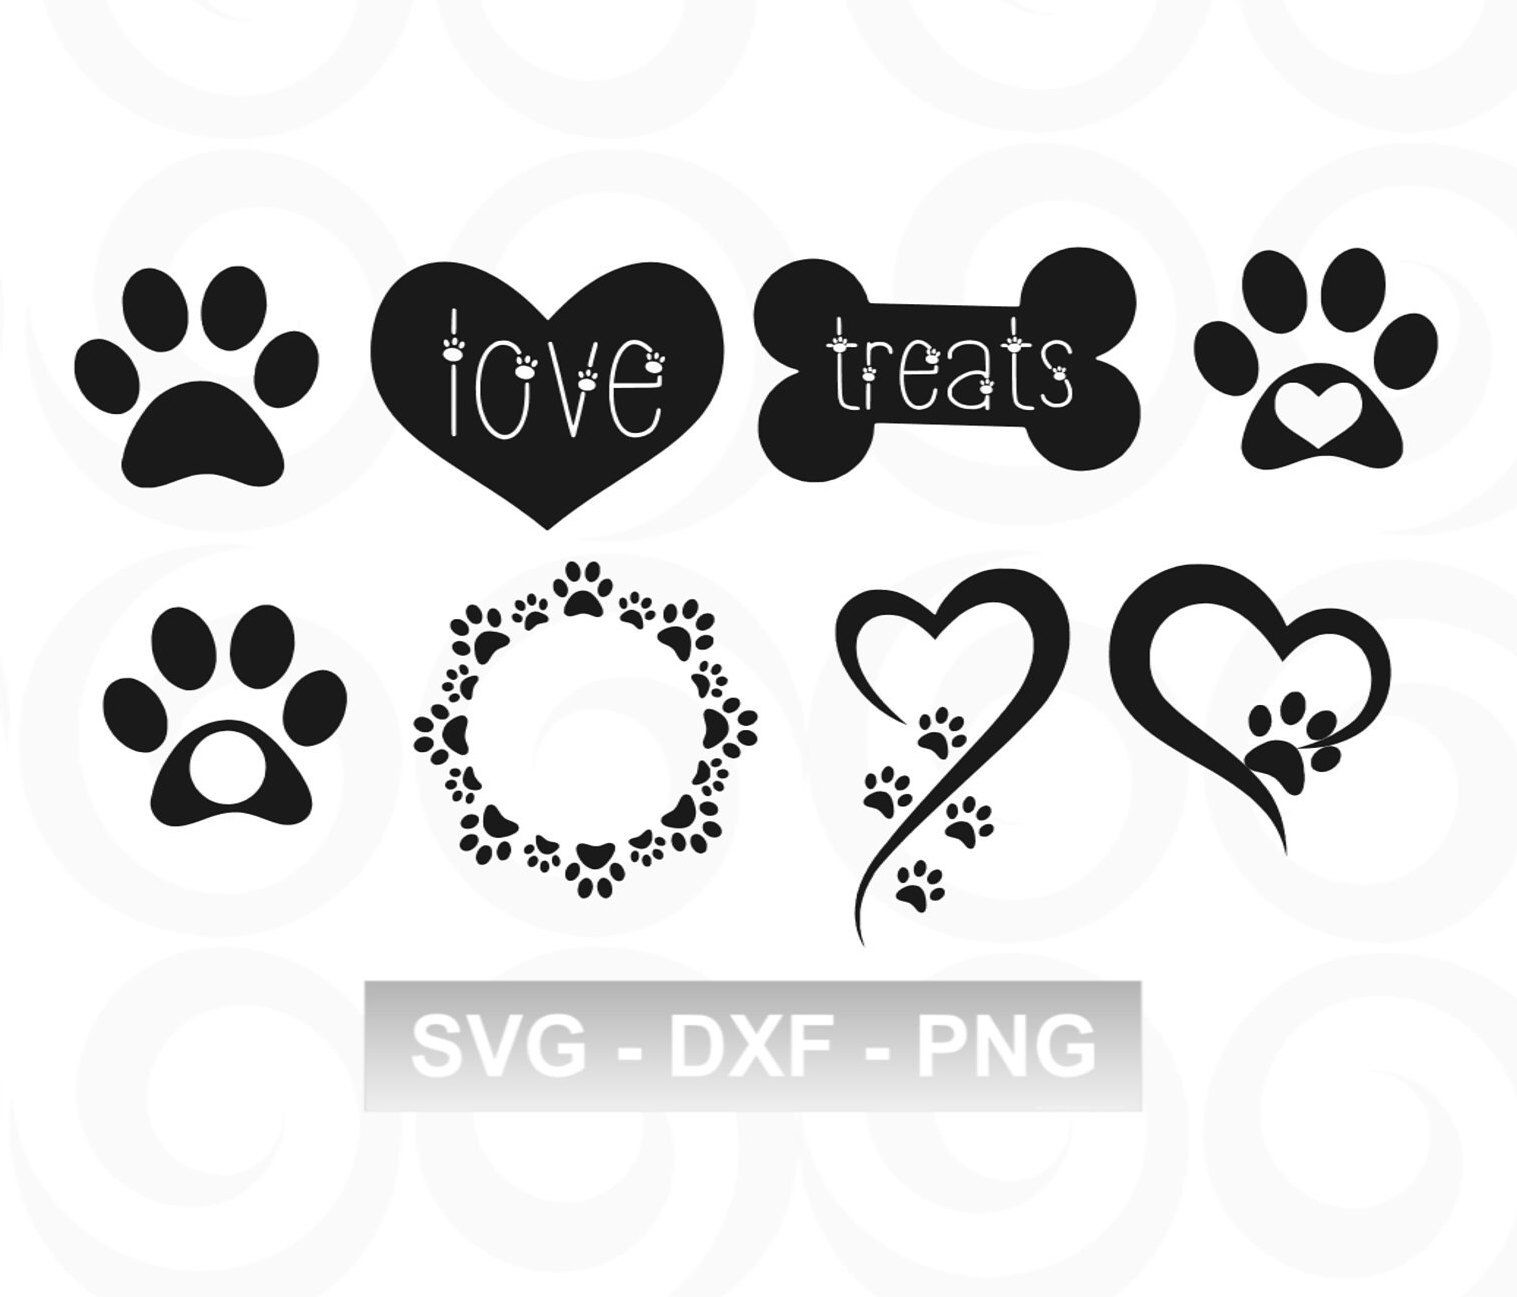 Dog Svg Paw Svg Pet Svg Paw Print Svg Heart Svg Etsy In 2020 Monogram Svg Dog Tattoos Vinyl Designs